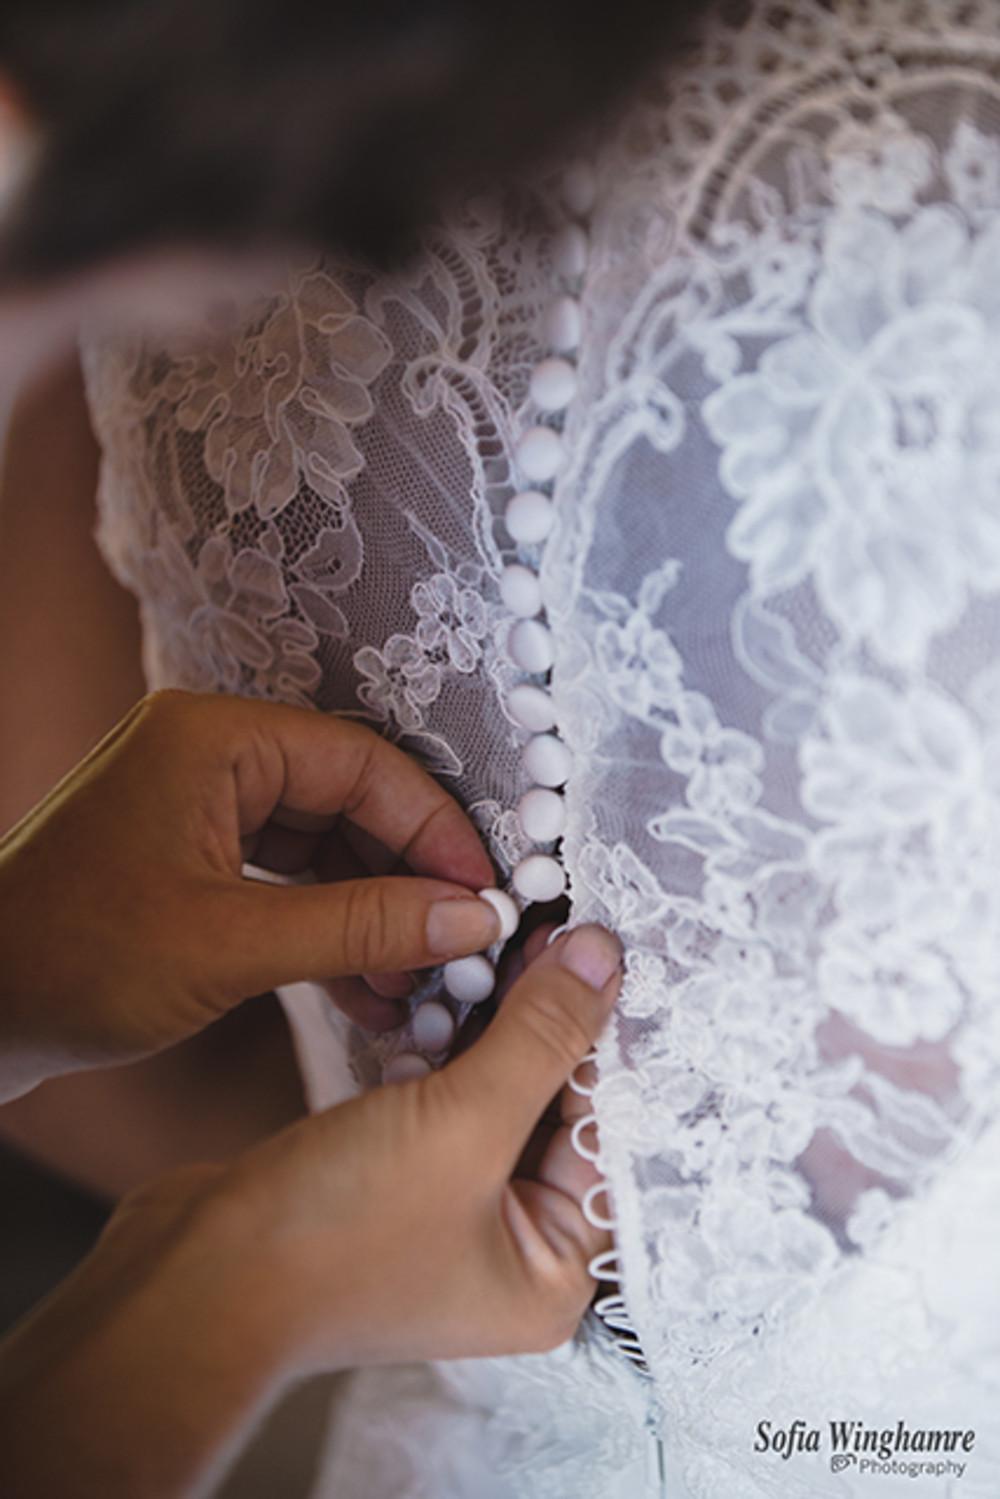 getting the wedding dress on!